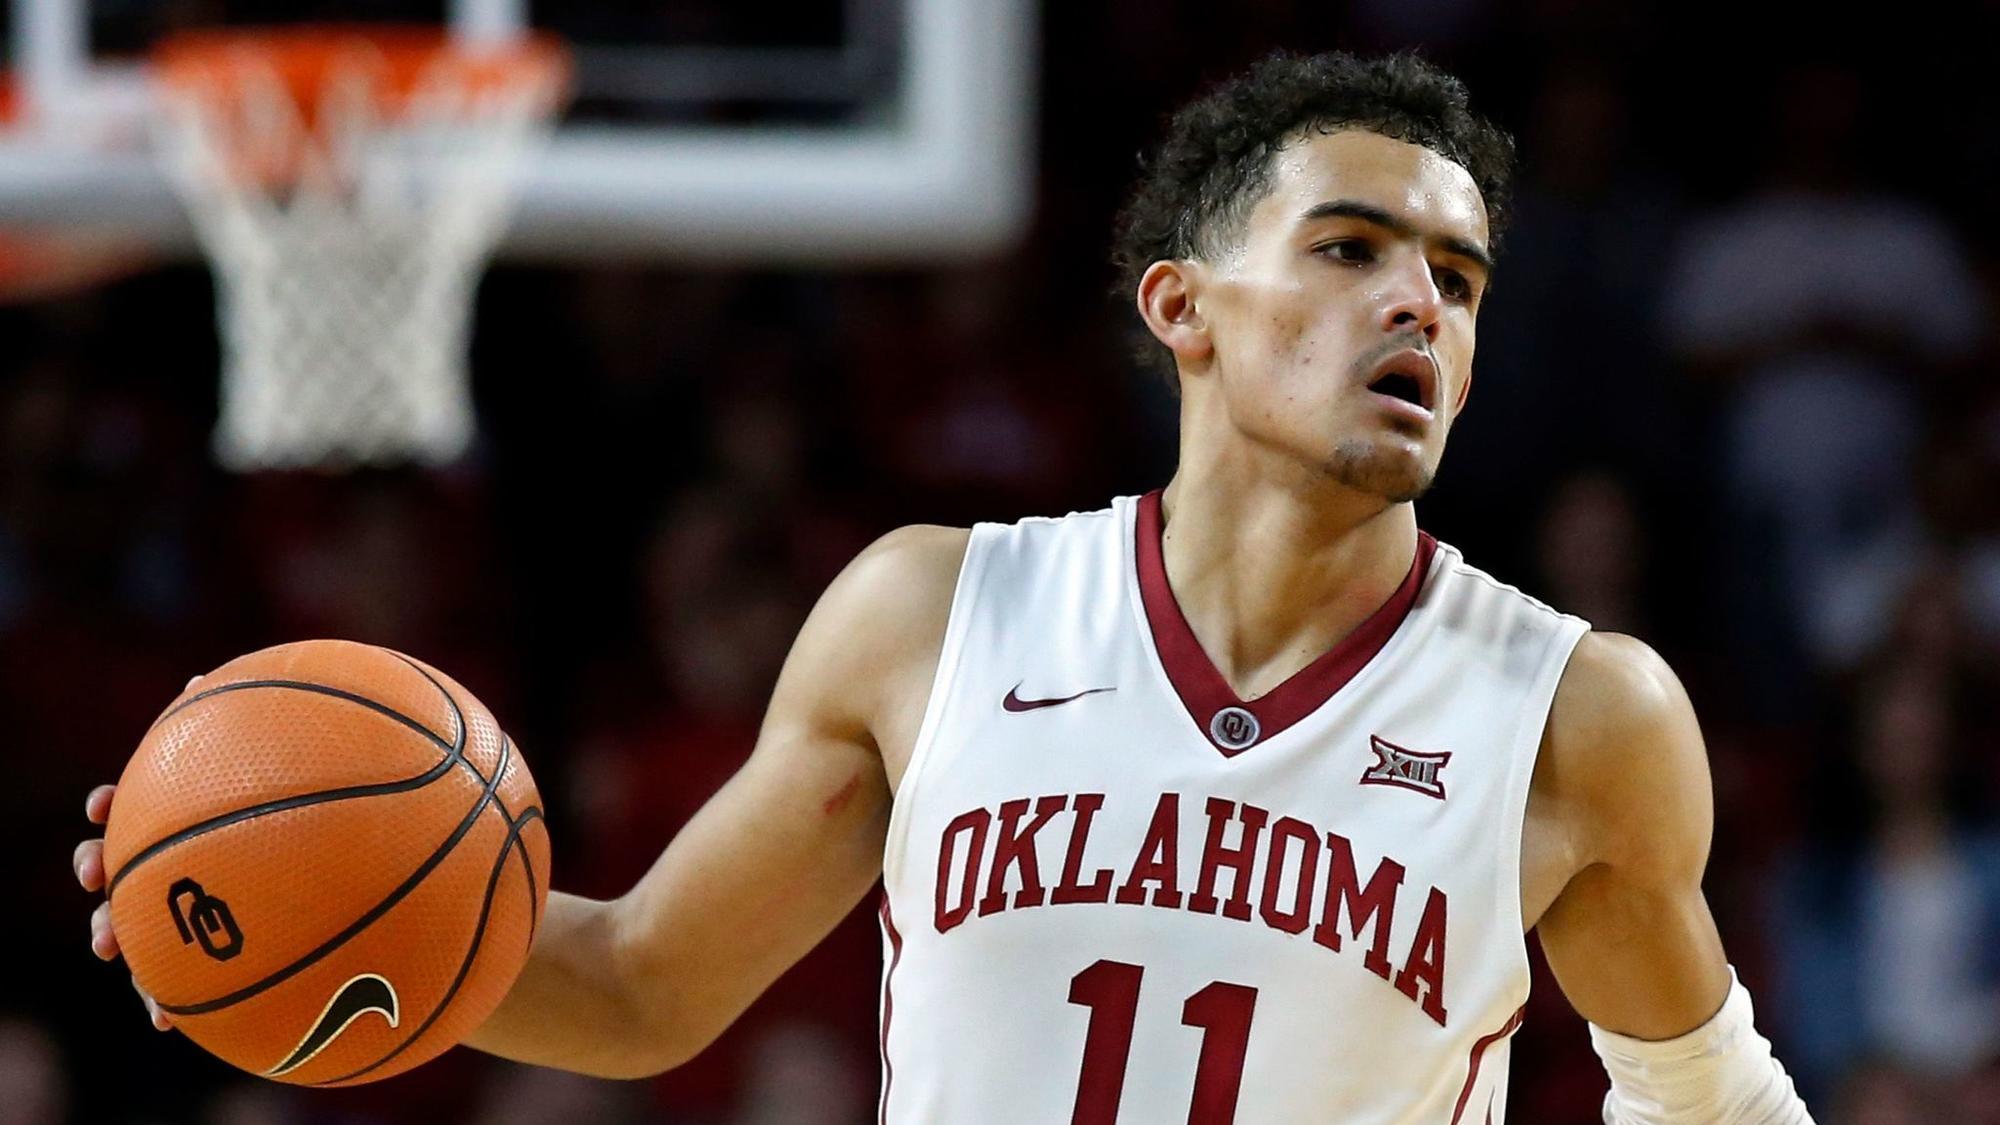 Charles Barkley, Dick Vitale rip into Oklahoma's selection for NCAA tournament